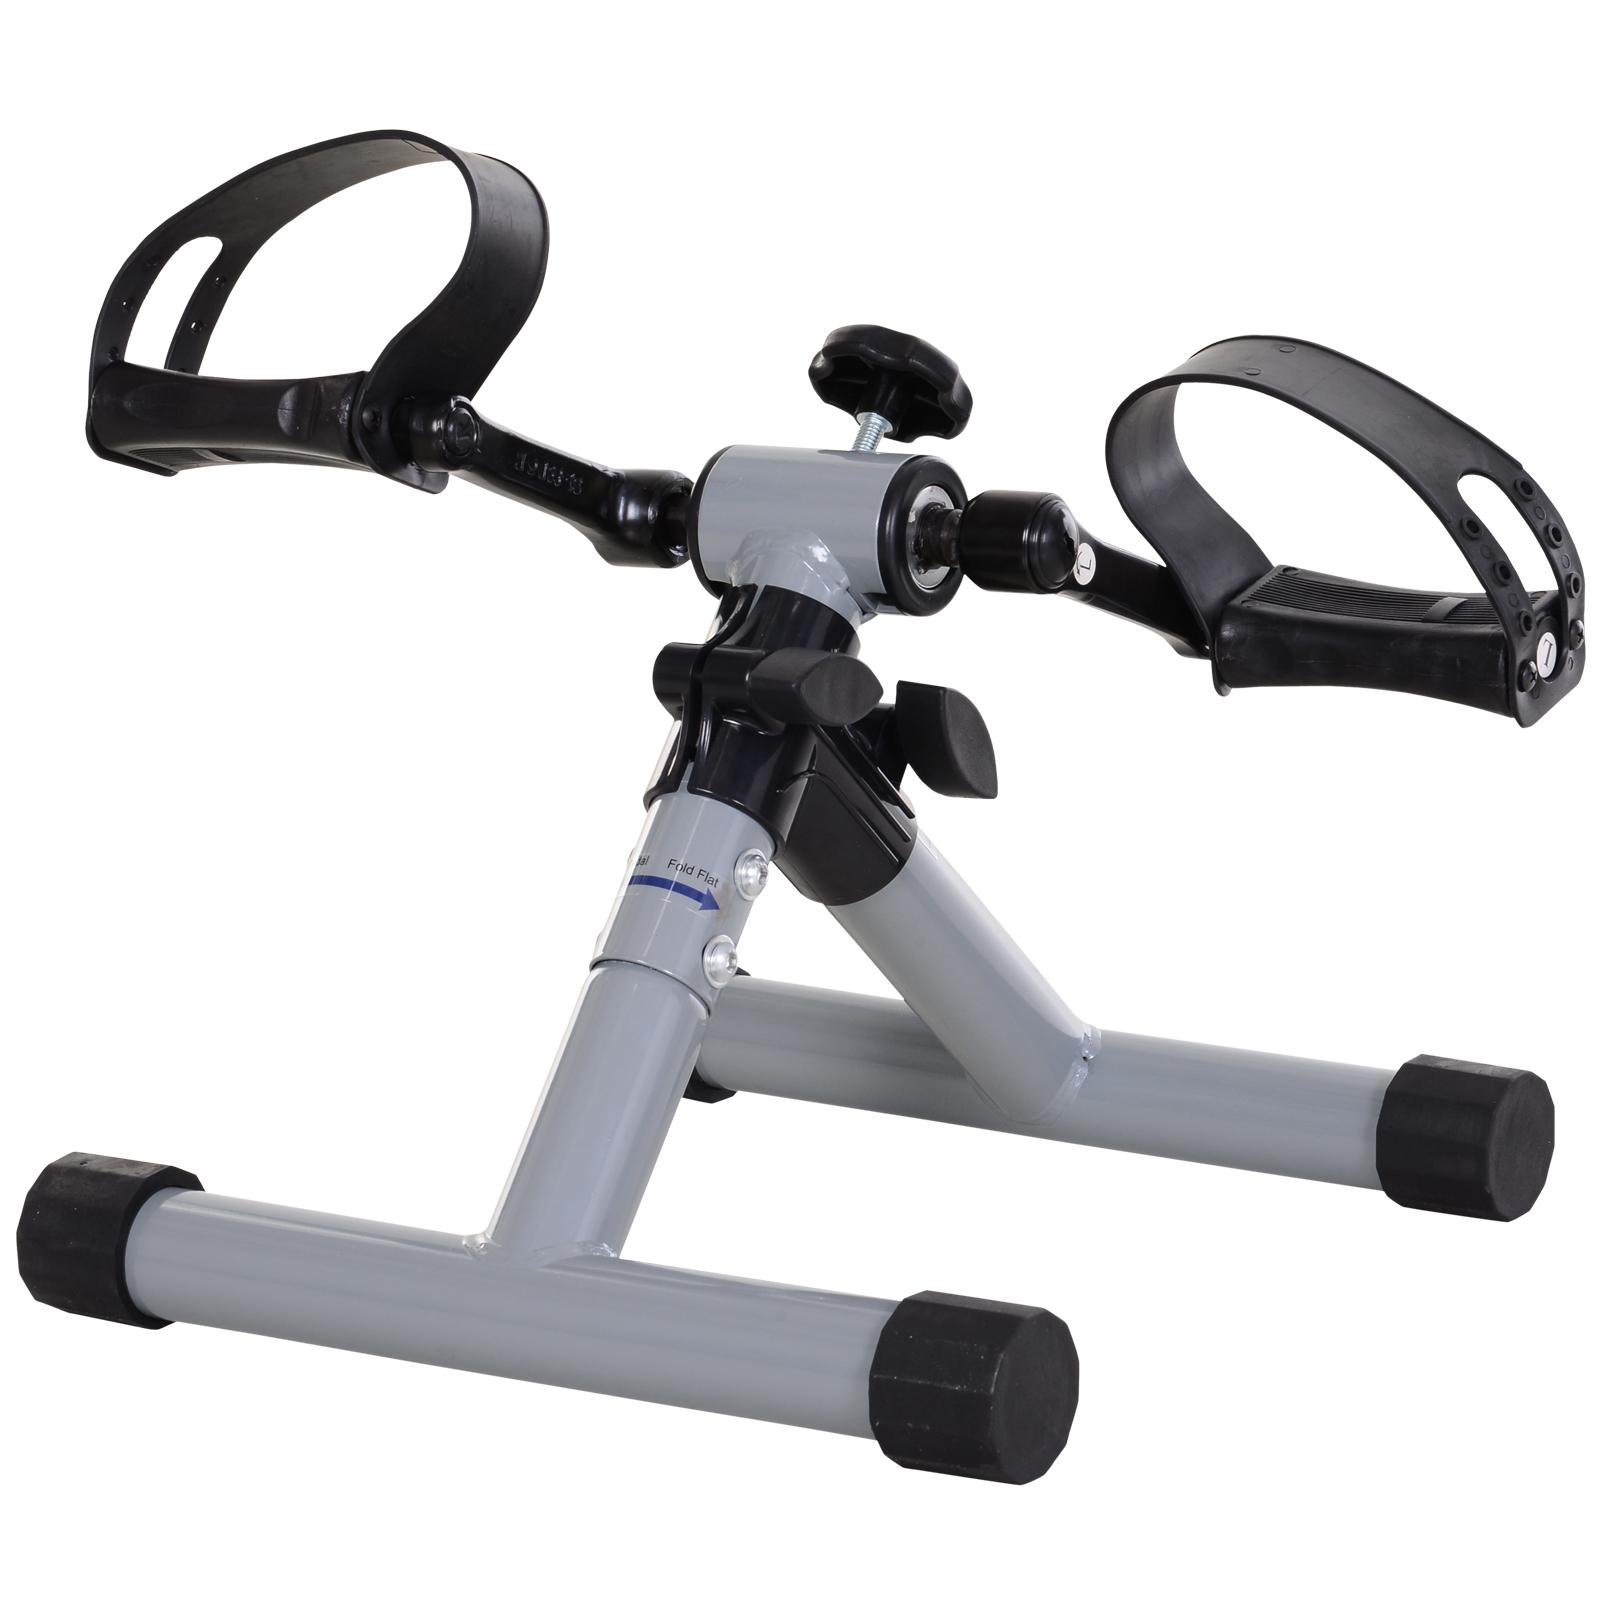 HOMCOM Mini Cyclette Pedaliera per Gambe e Braccia Fitness a Casa Livelli Regolabili